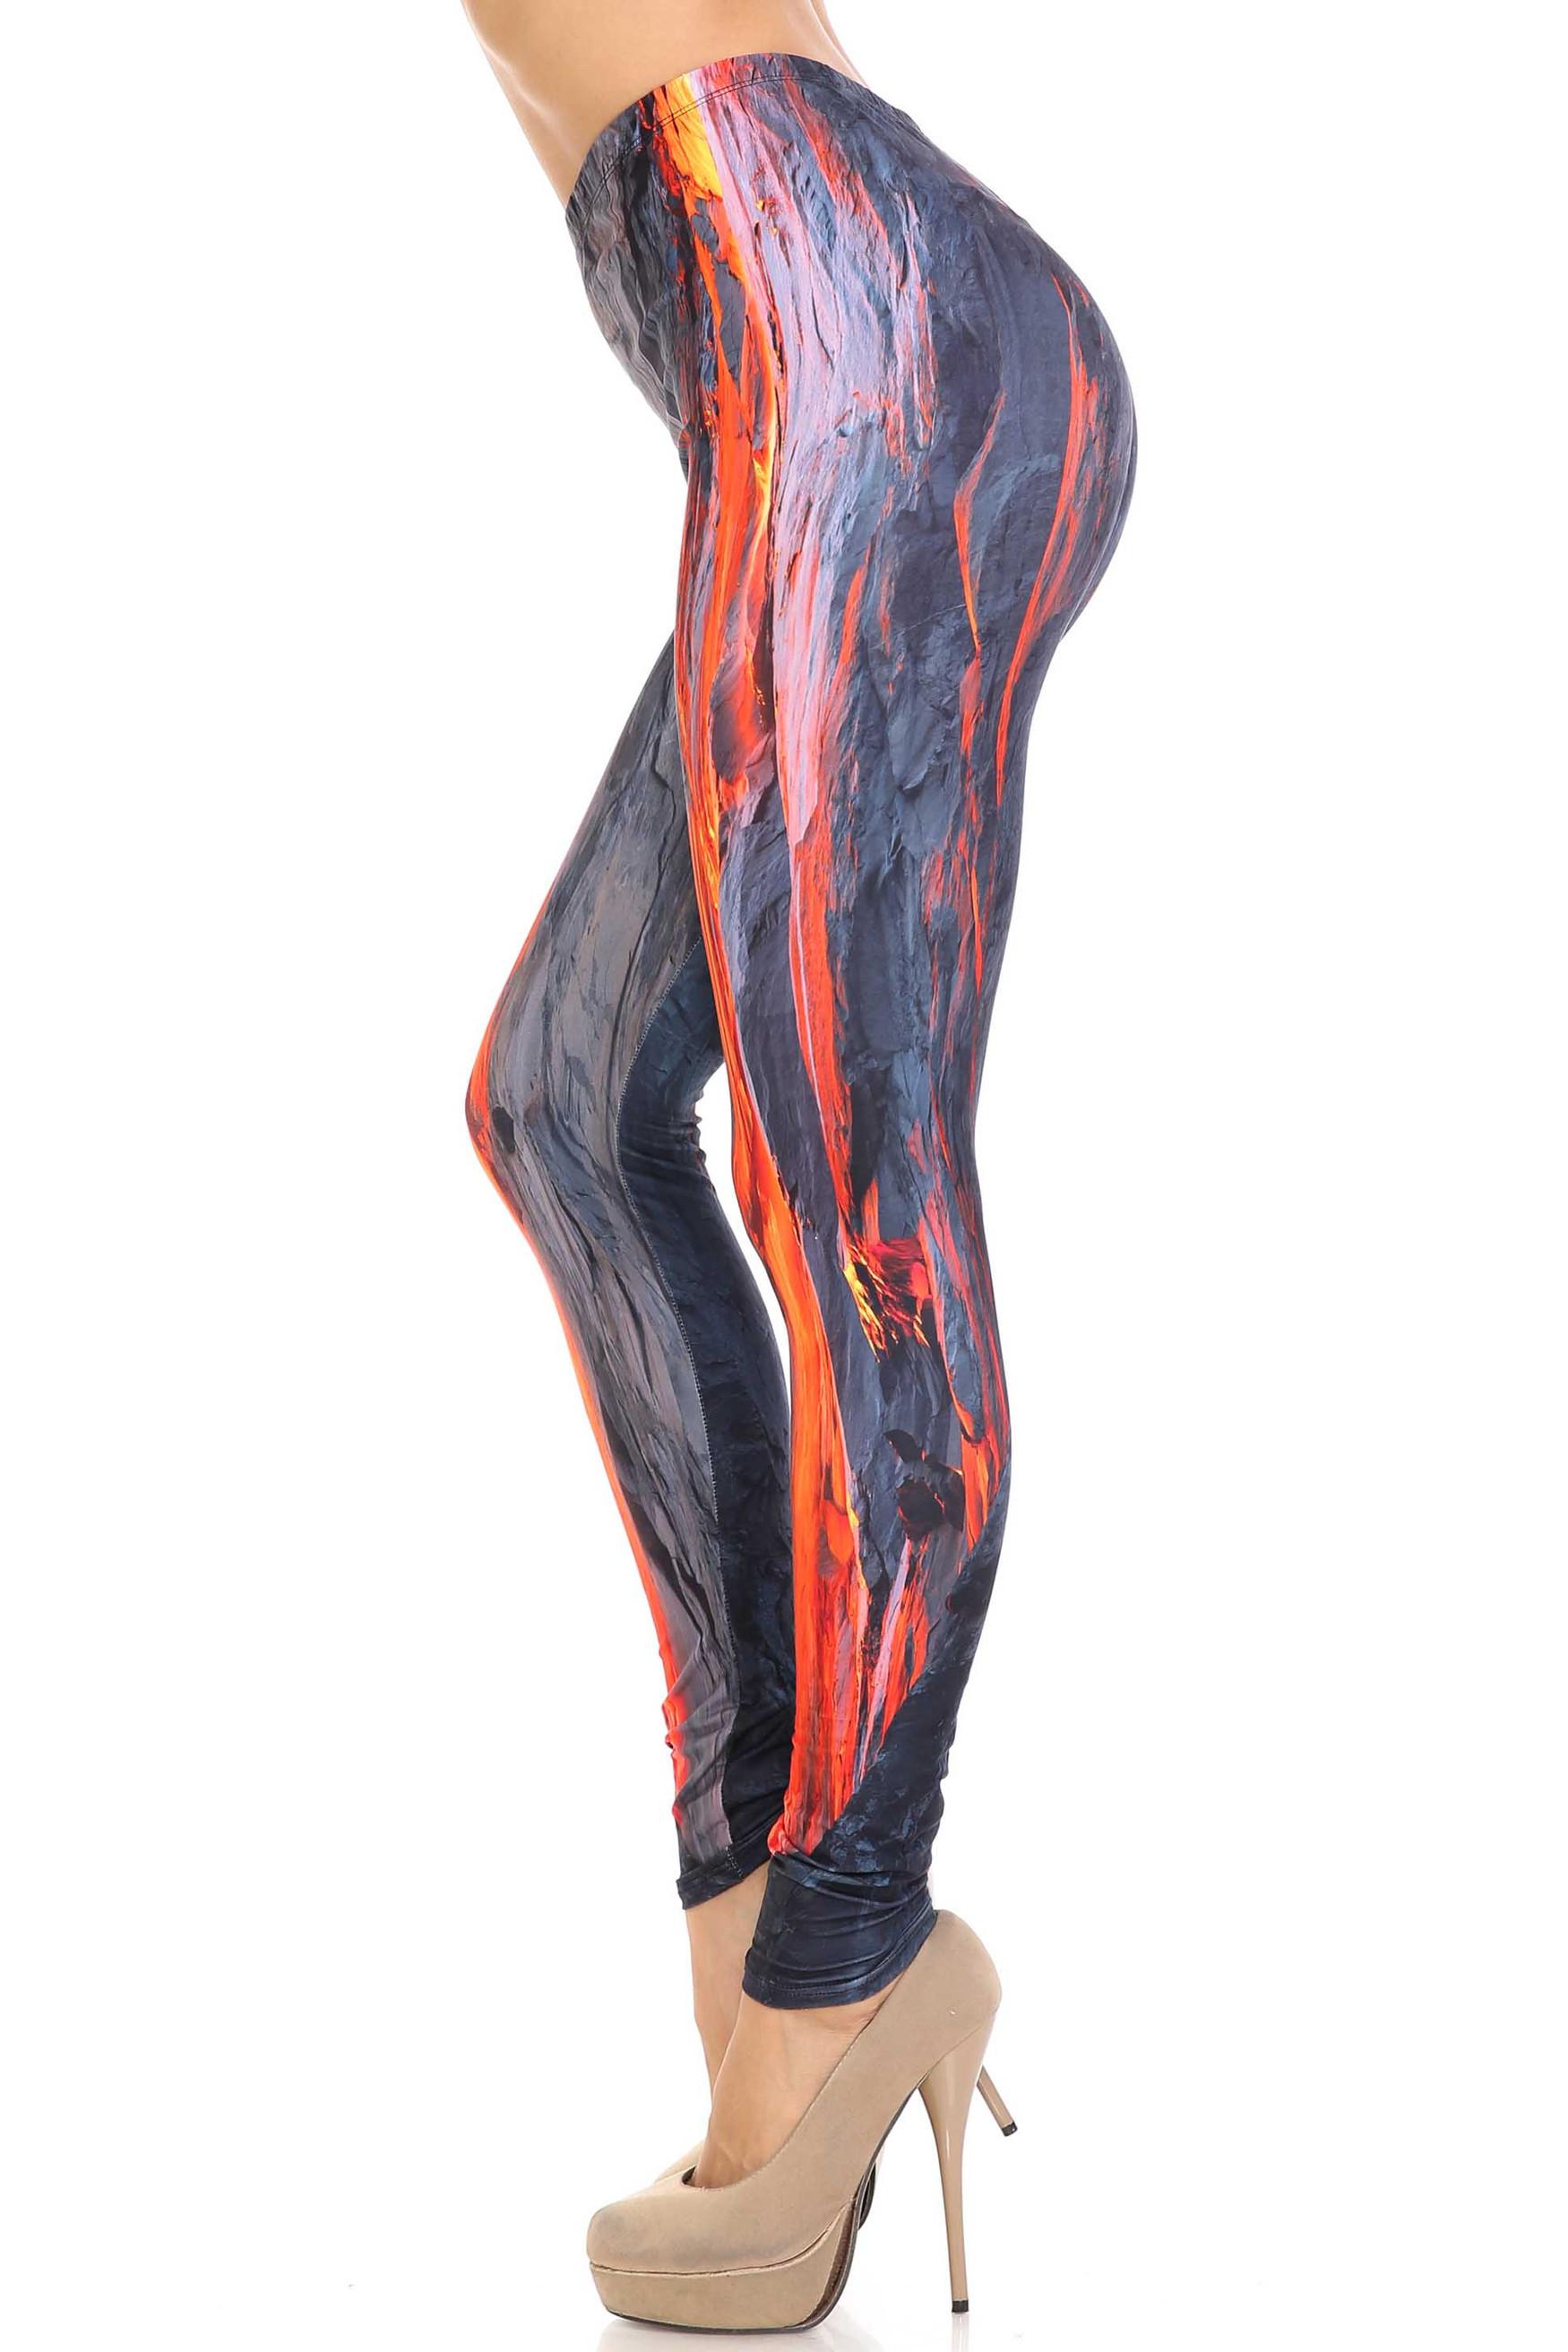 Creamy Soft Hot Lava Extra Plus Size Leggings - 3X-5X - By USA Fashion™